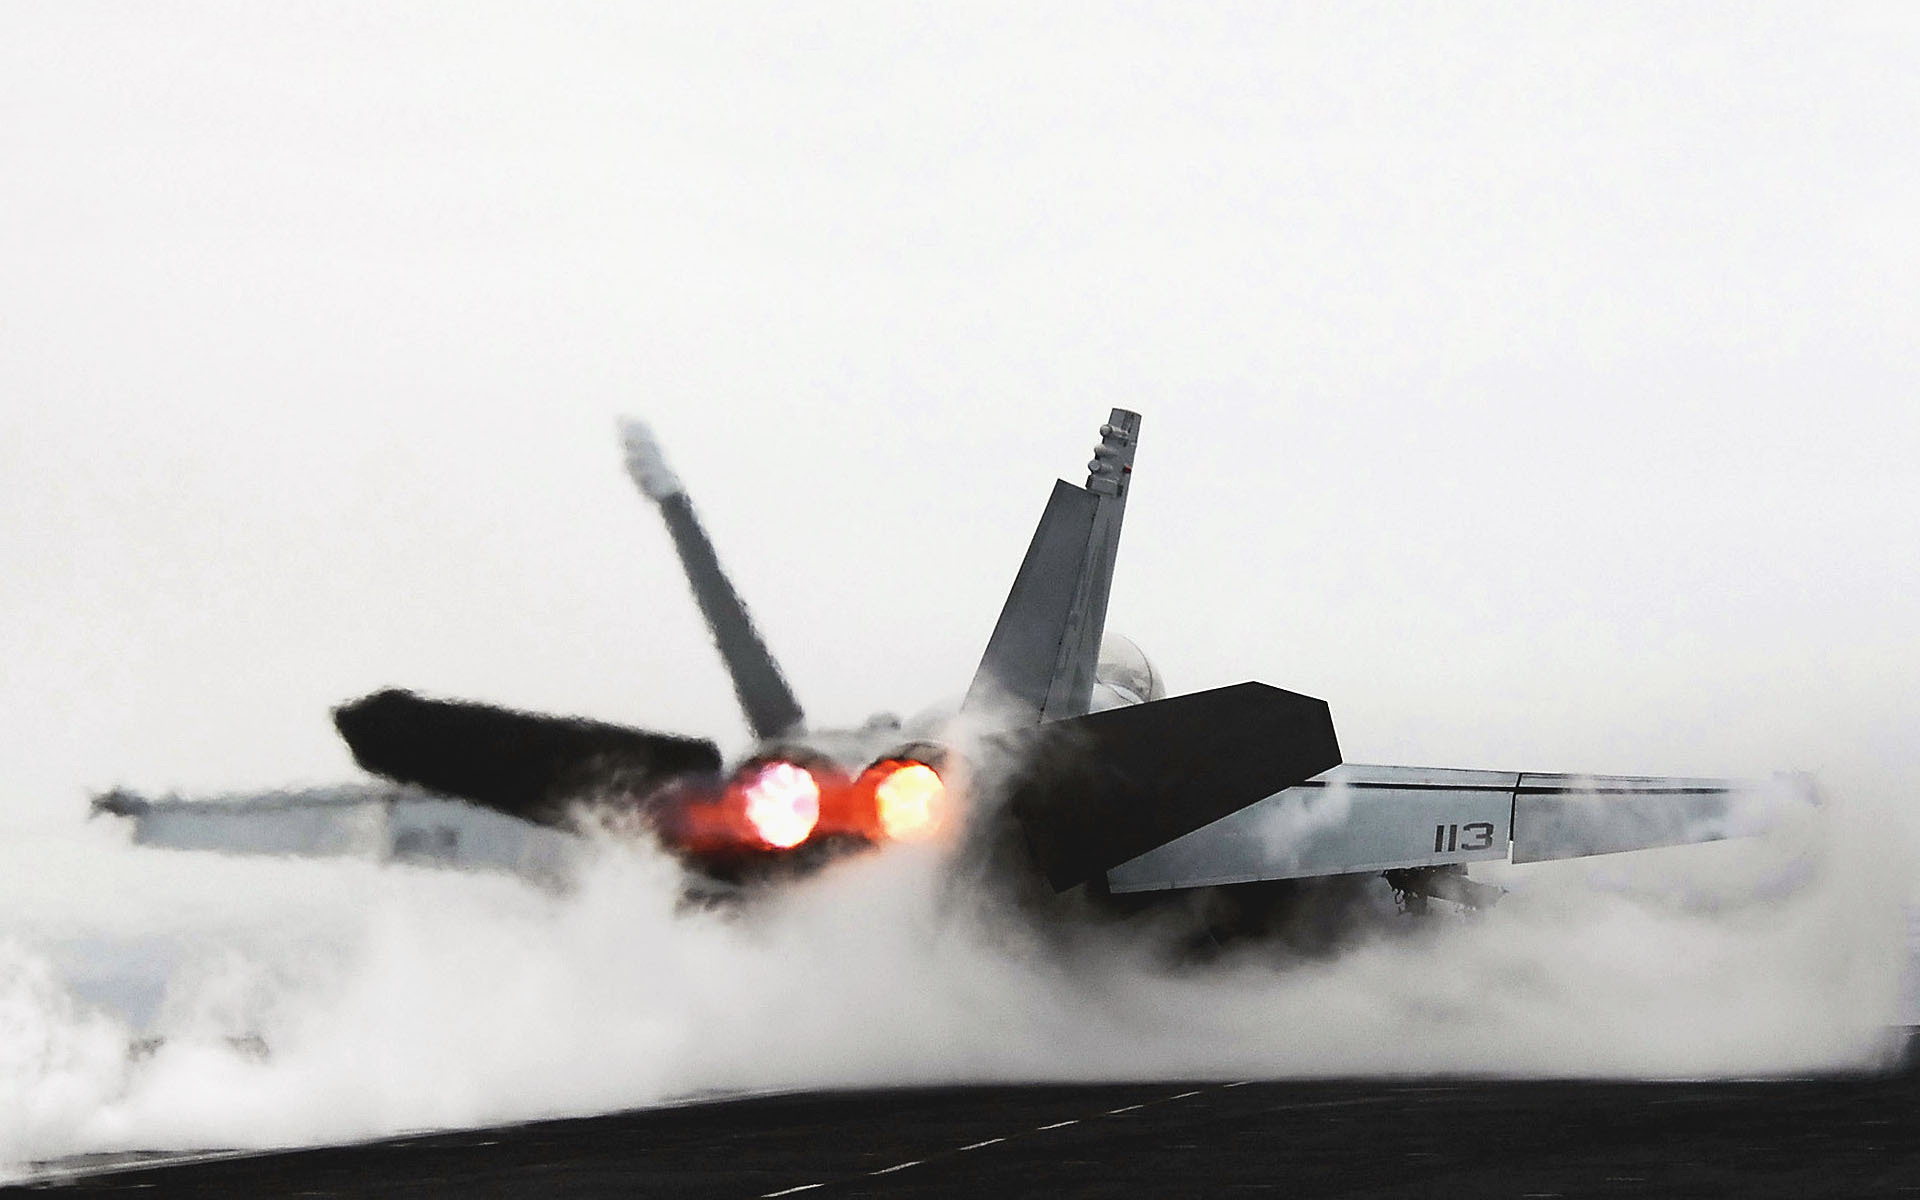 Fighter jet take off